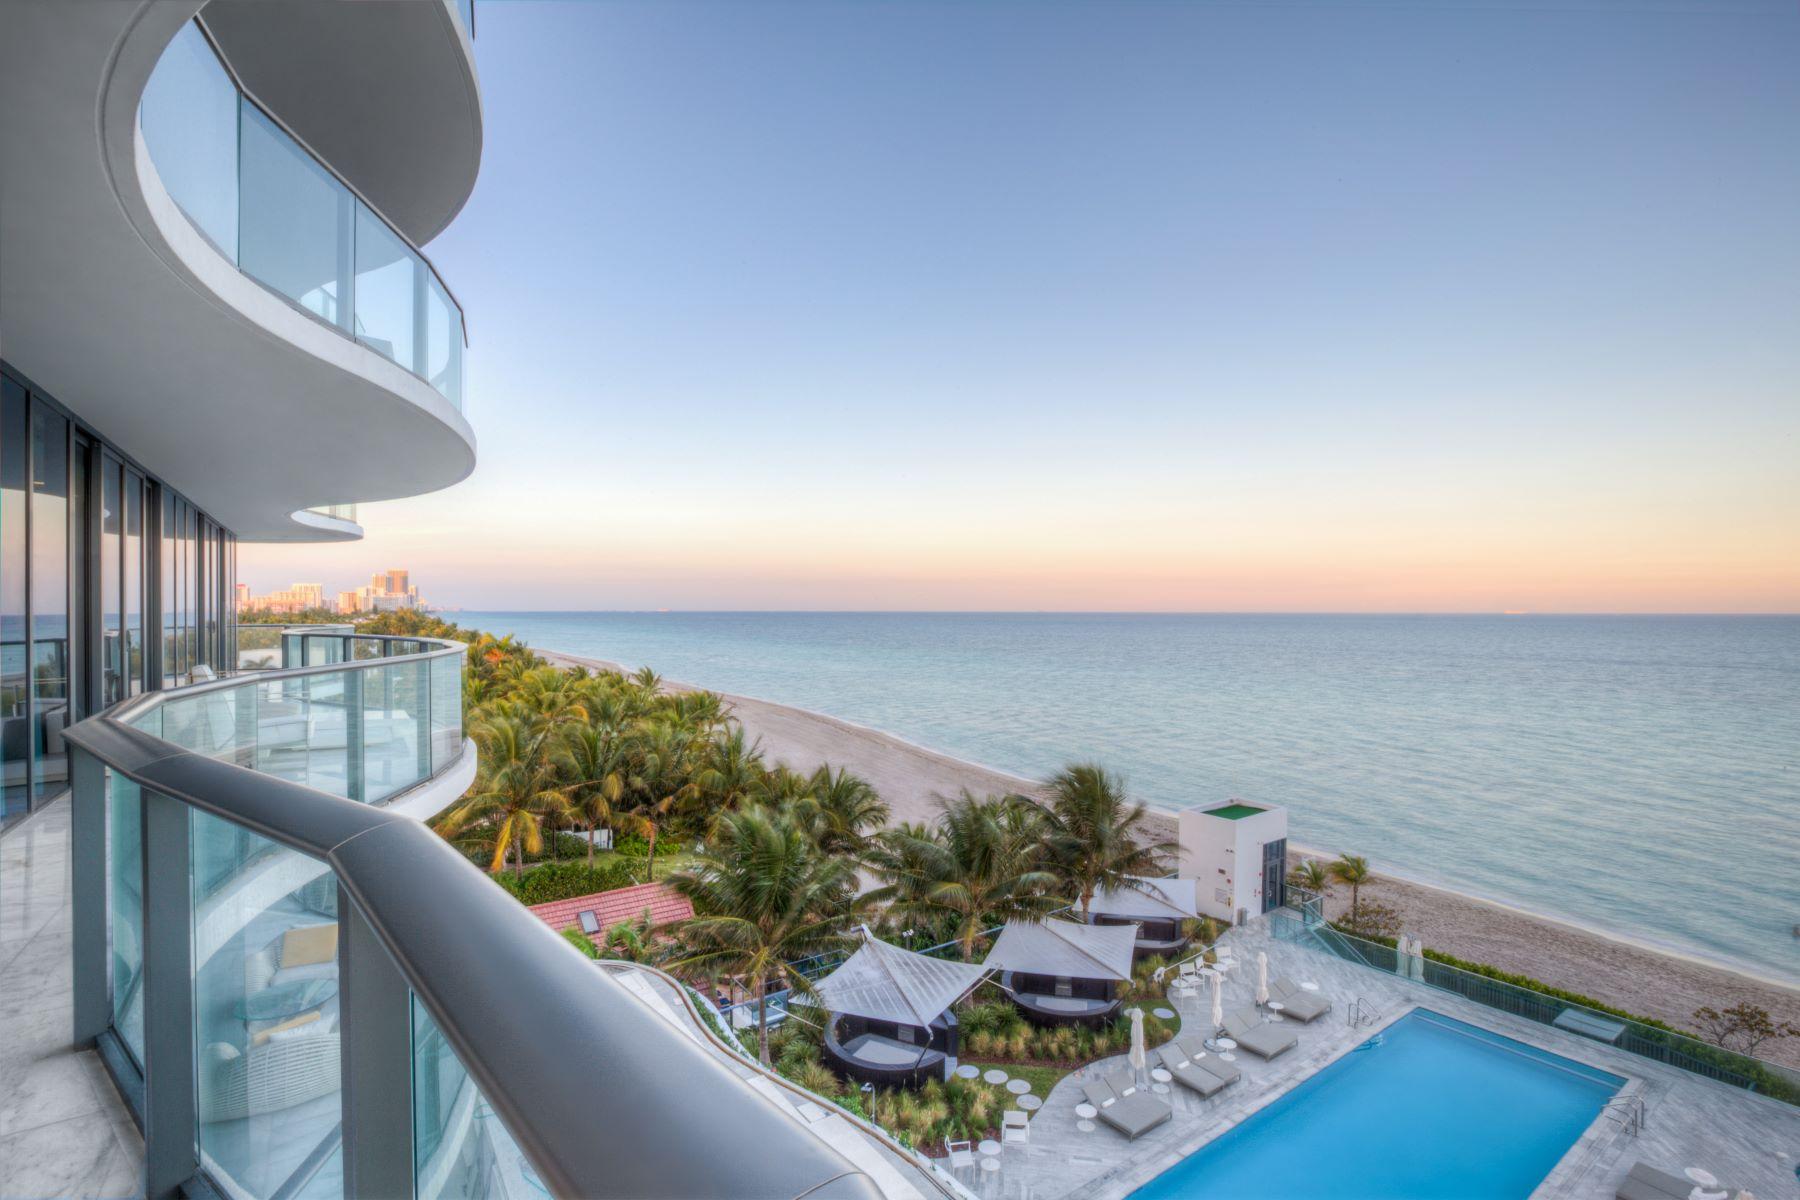 شقة بعمارة للـ Sale في 19575 Collins Ave 19575 Collins Ave 6 Sunny Isles Beach, Florida 33160 United States